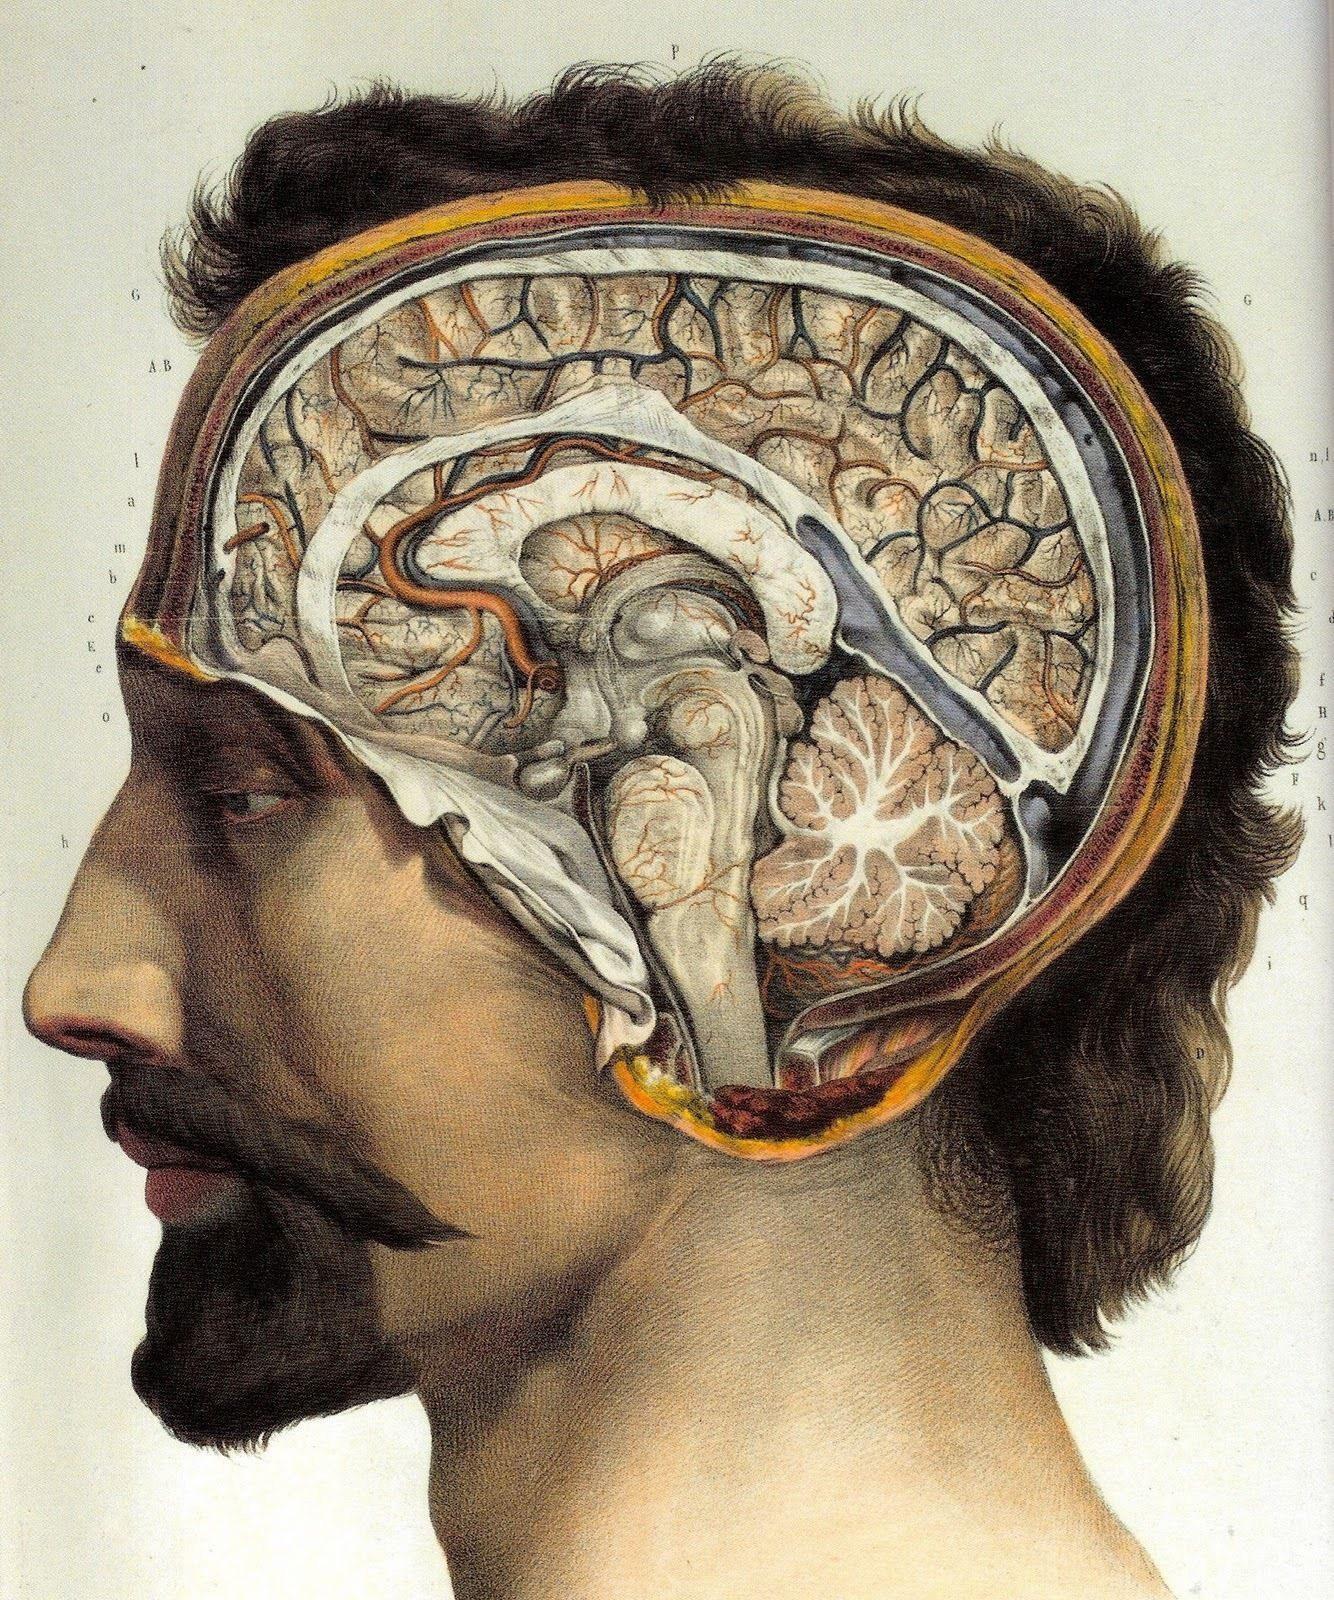 63569 Vintage 1800\'s Human Brain Surgical Anatomy Wall Print Poster ...